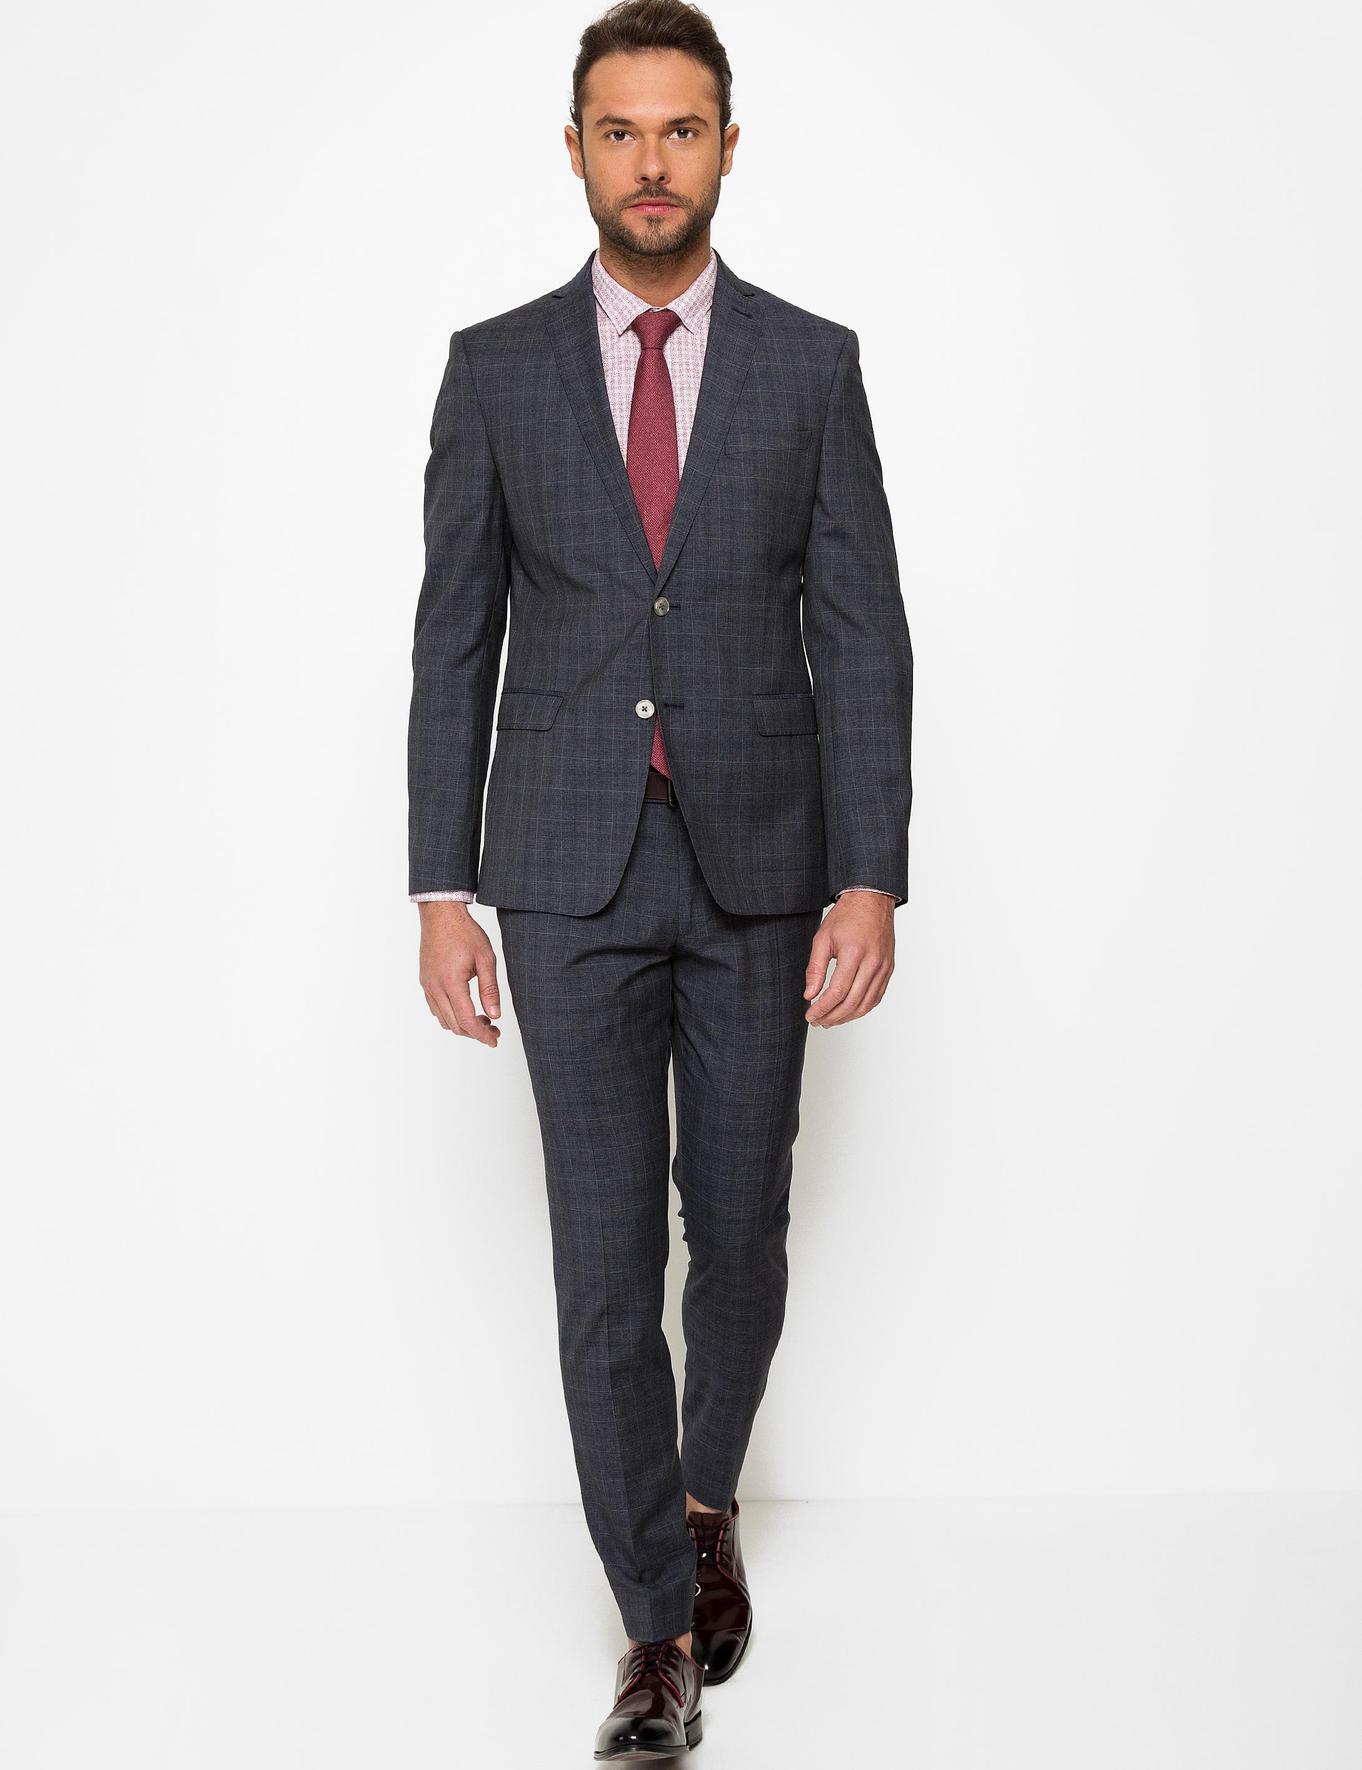 Antrasit Slim Fit Takım Elbise - 50185783005